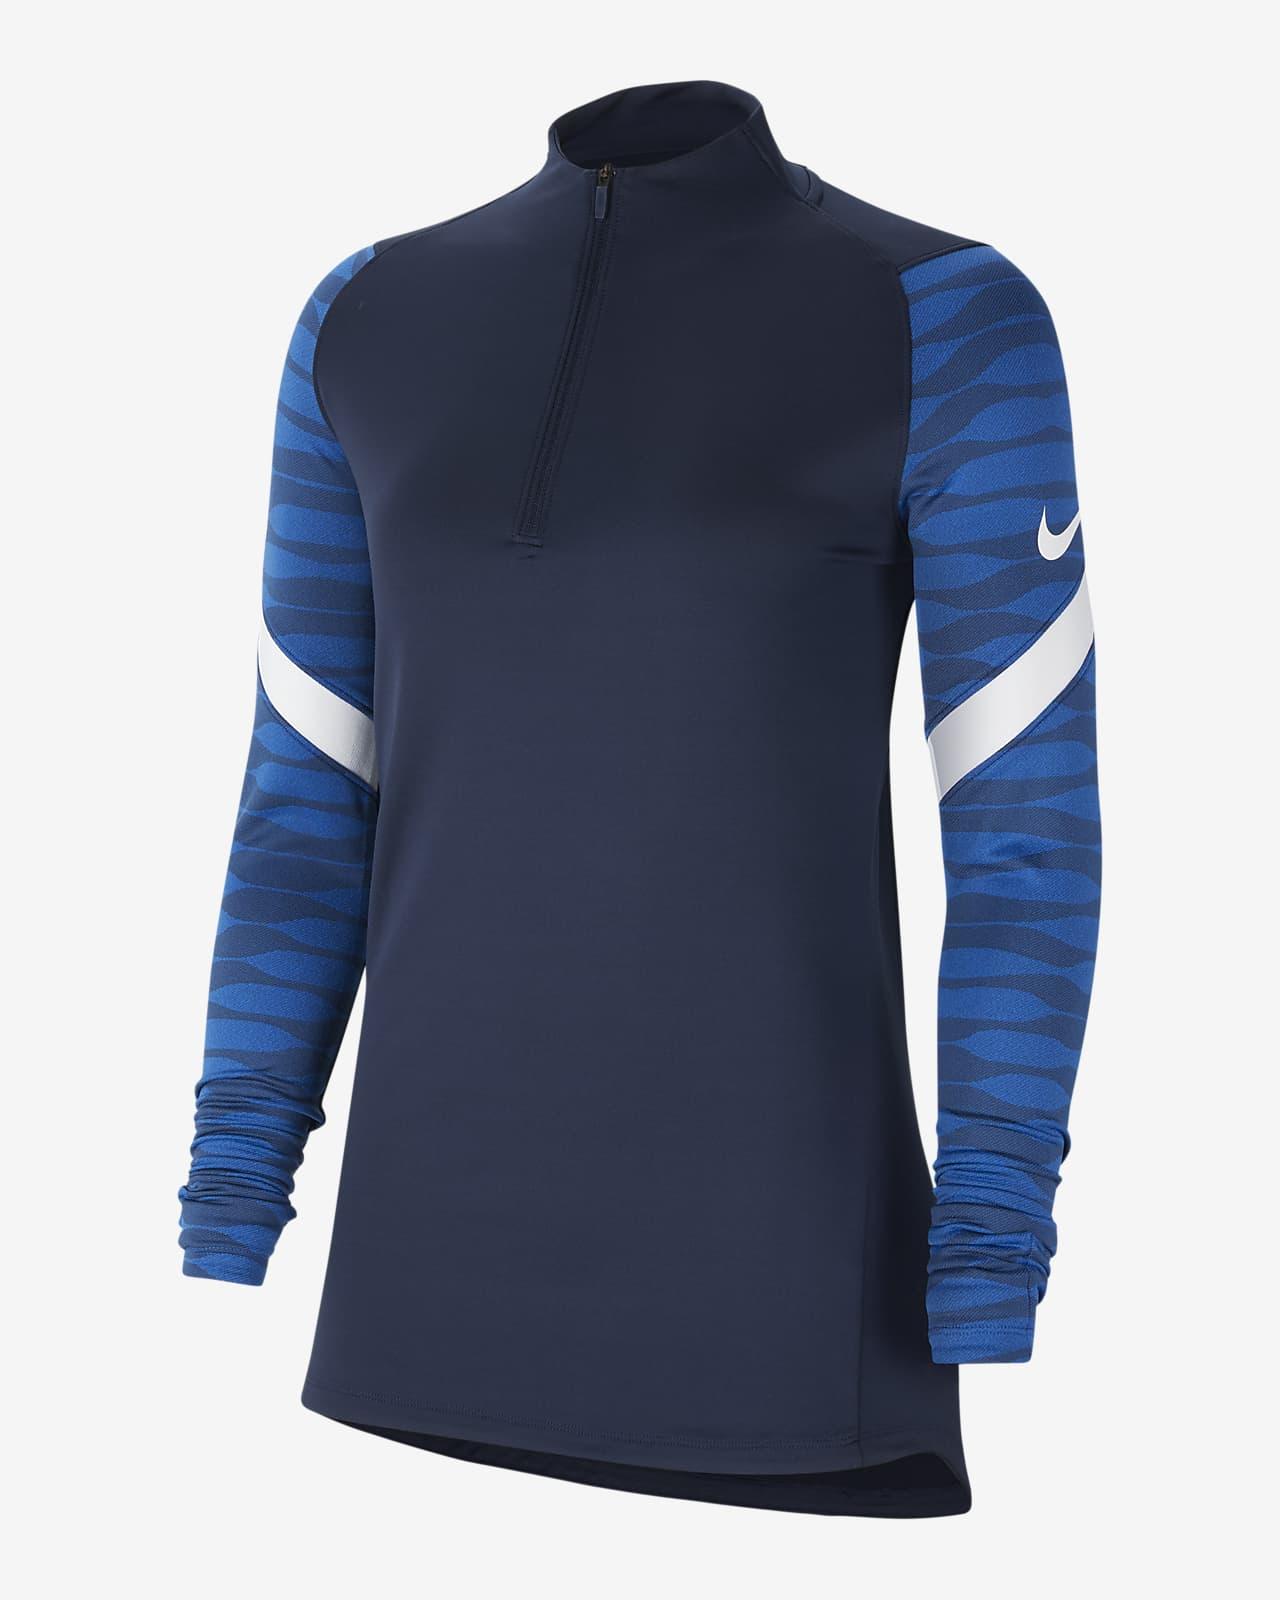 Nike Dri-FIT Strike Women's 1/4-Zip Soccer Drill Top